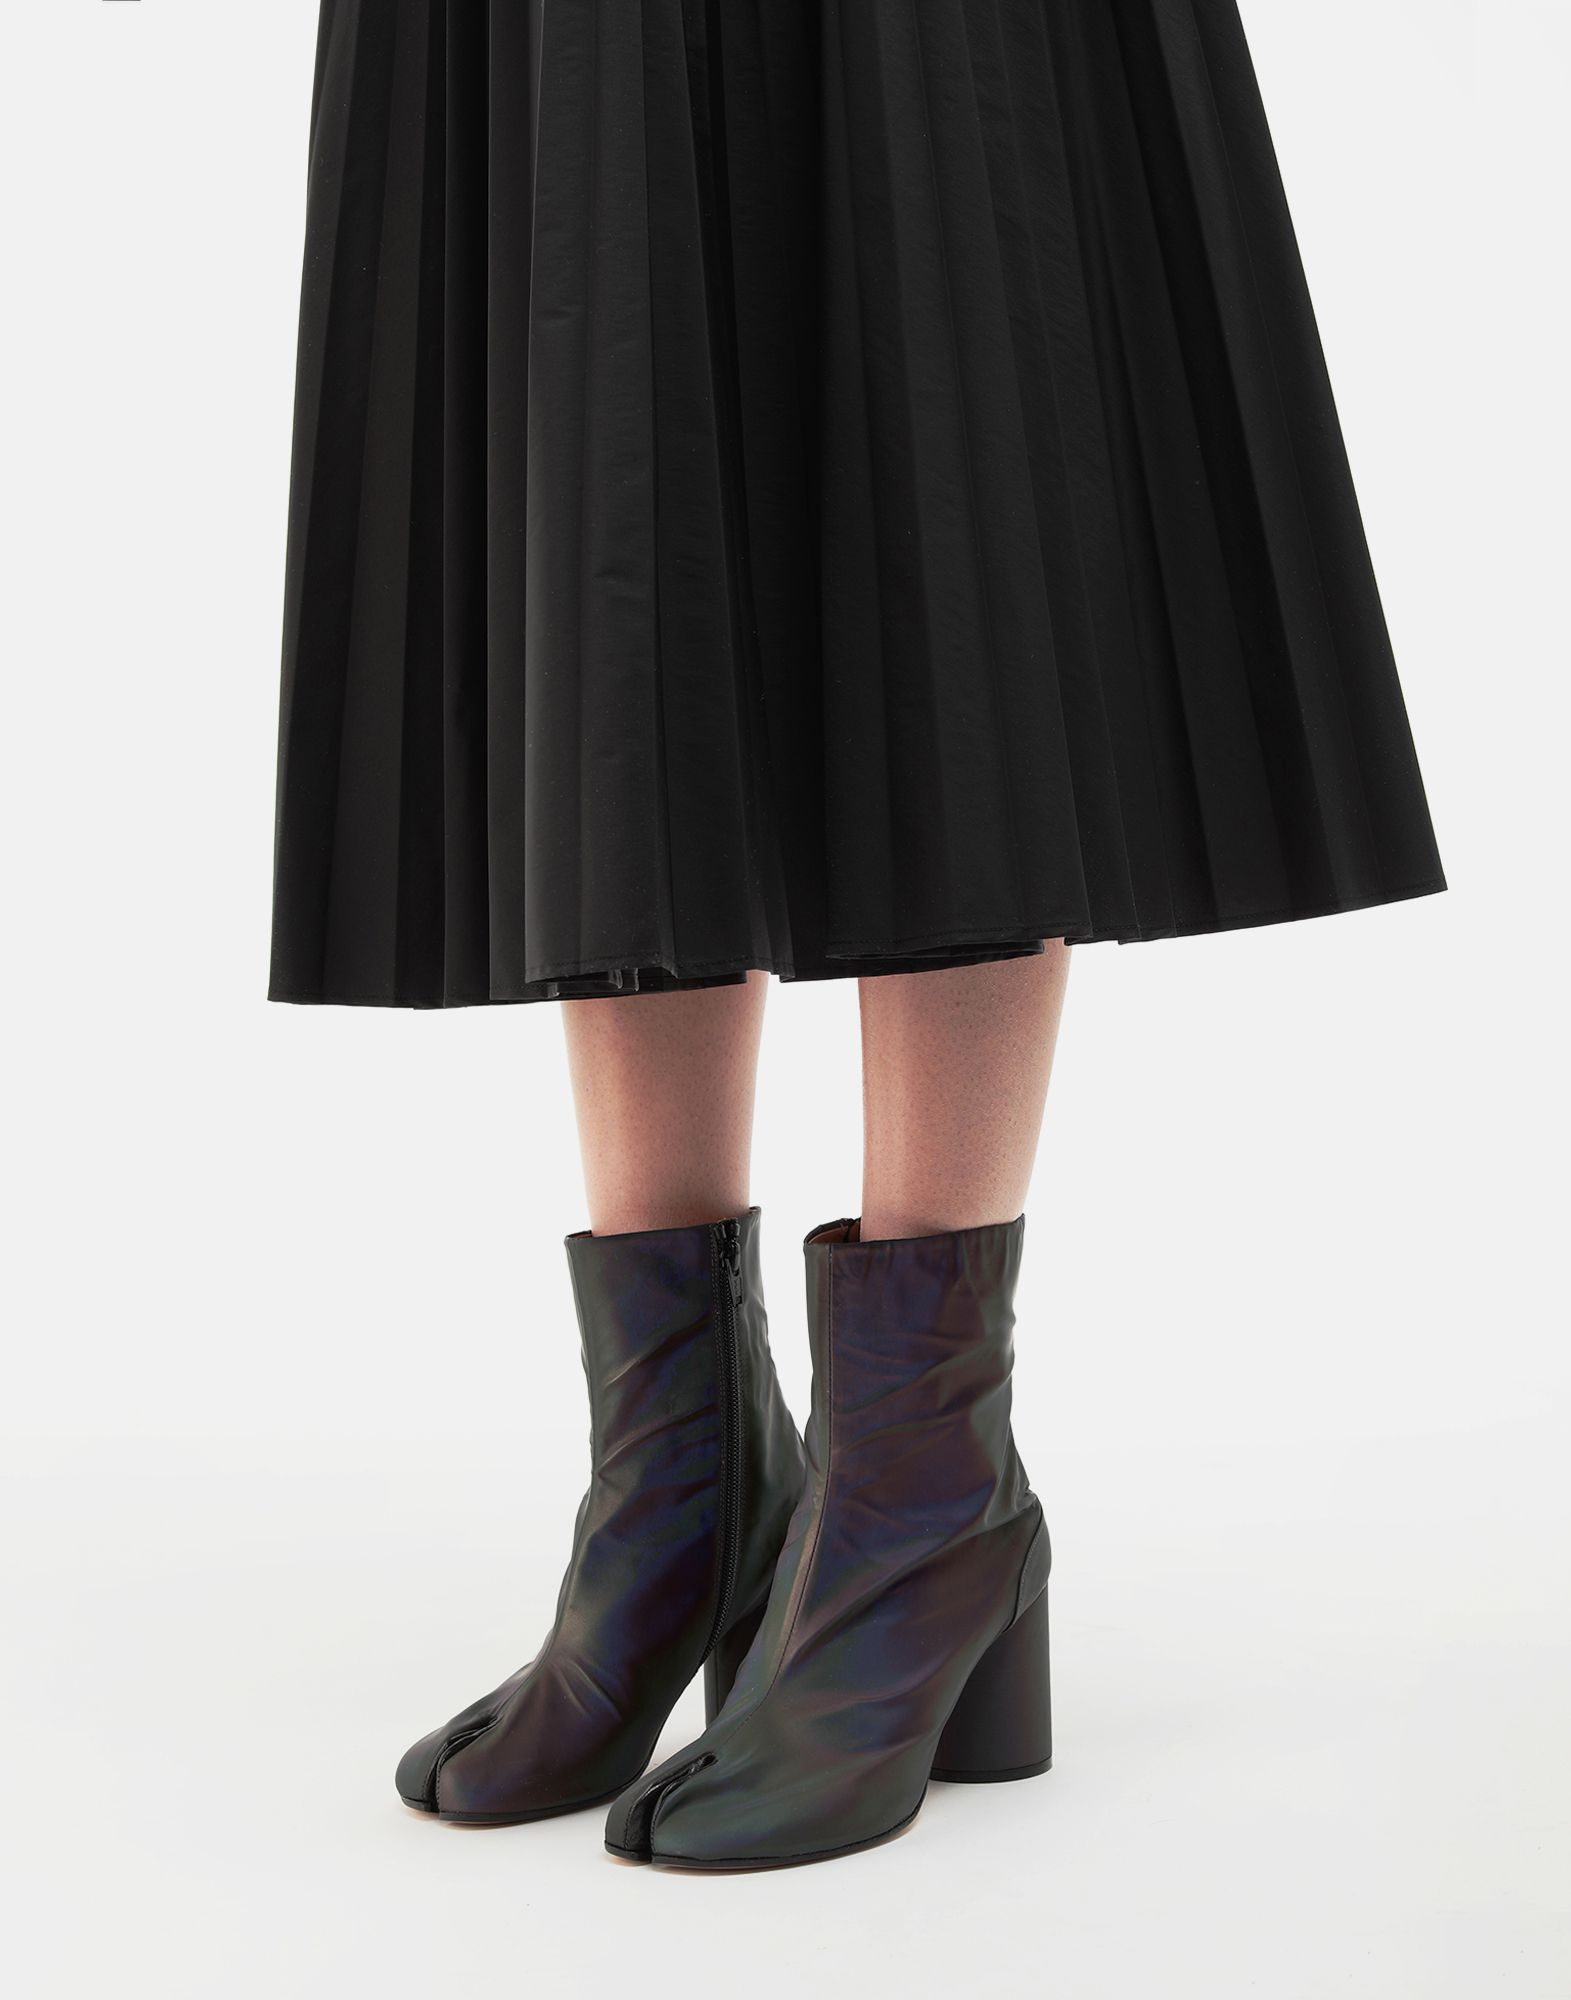 d2dfc0c69b3 Maison Margiela Reflective Tabi Boots Women | Maison Margiela Store